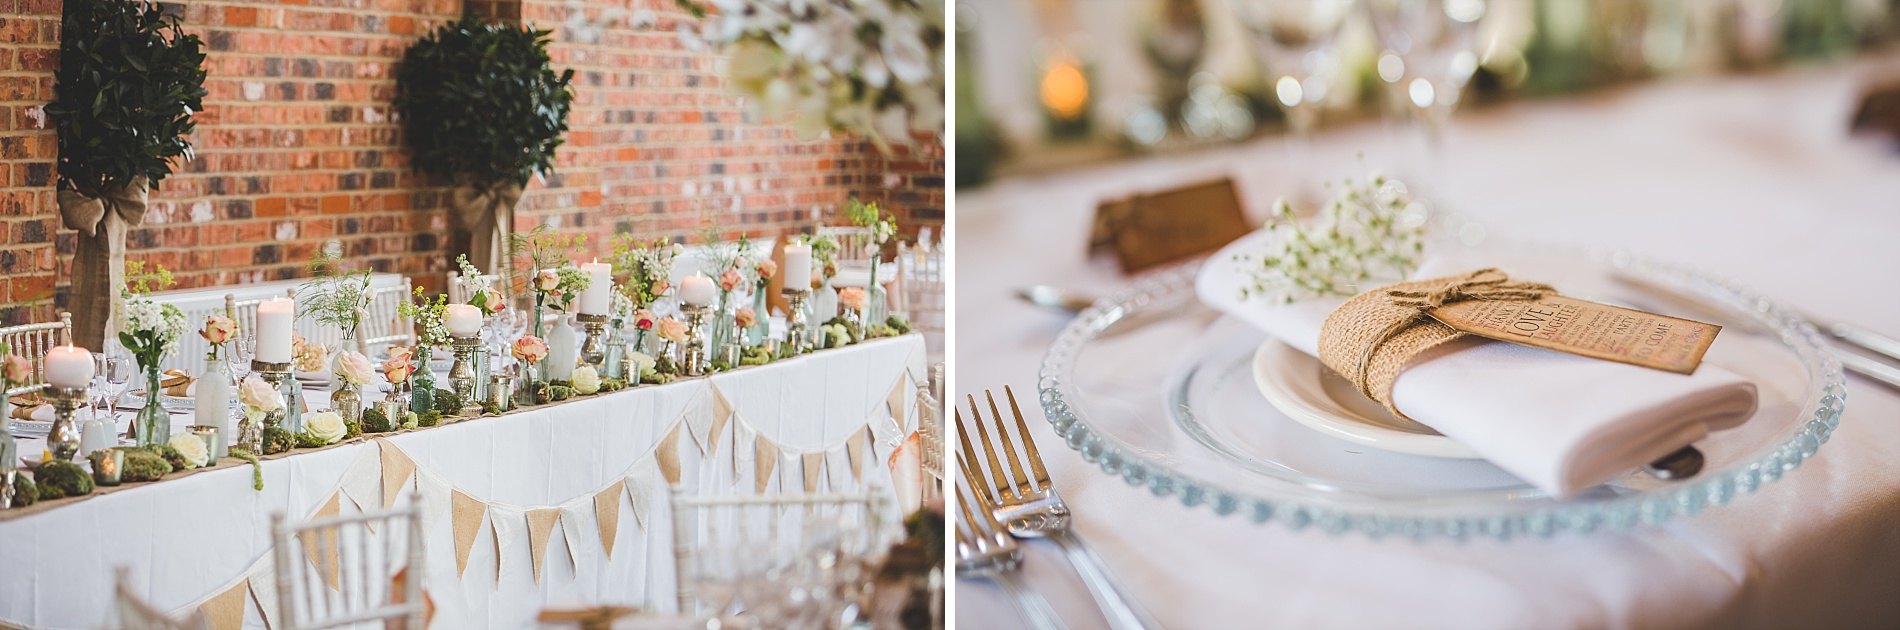 hall farm wedding photography (55)